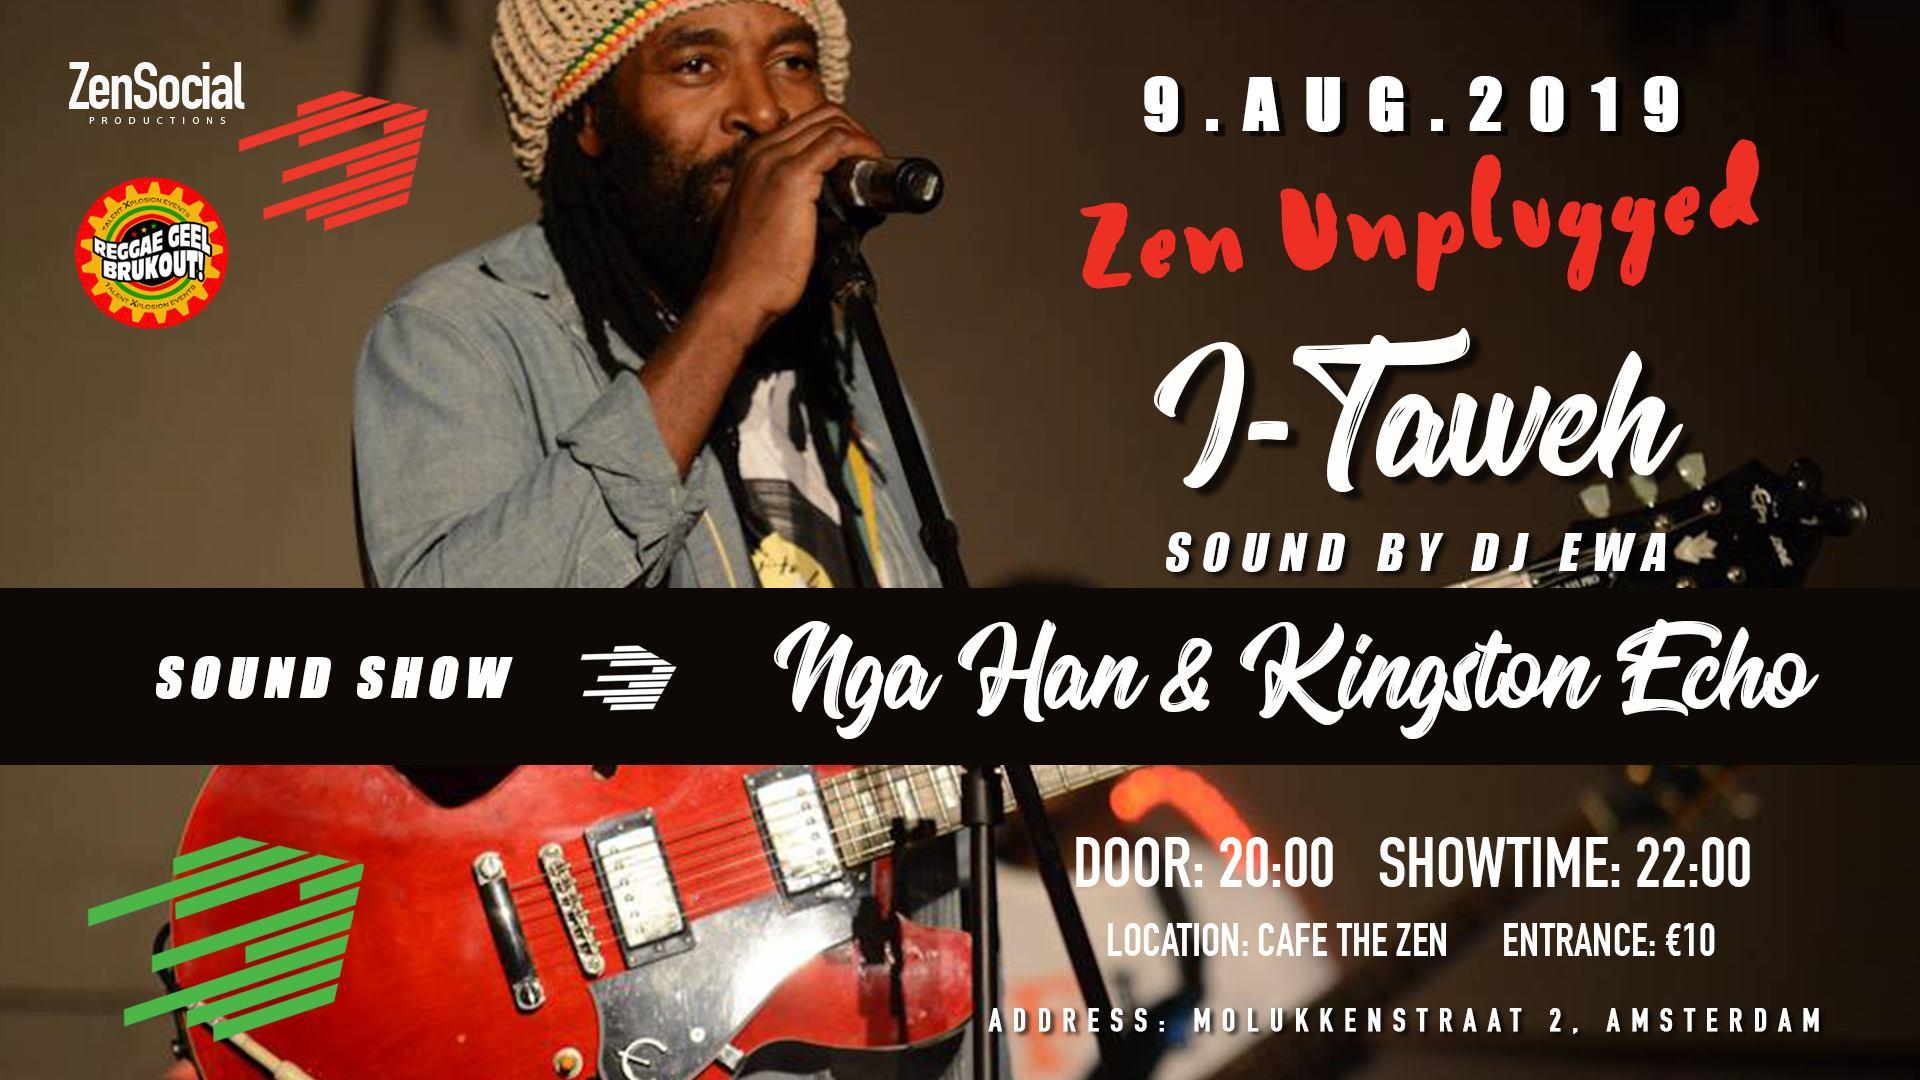 Zen Unplugged ft. I-Taweh